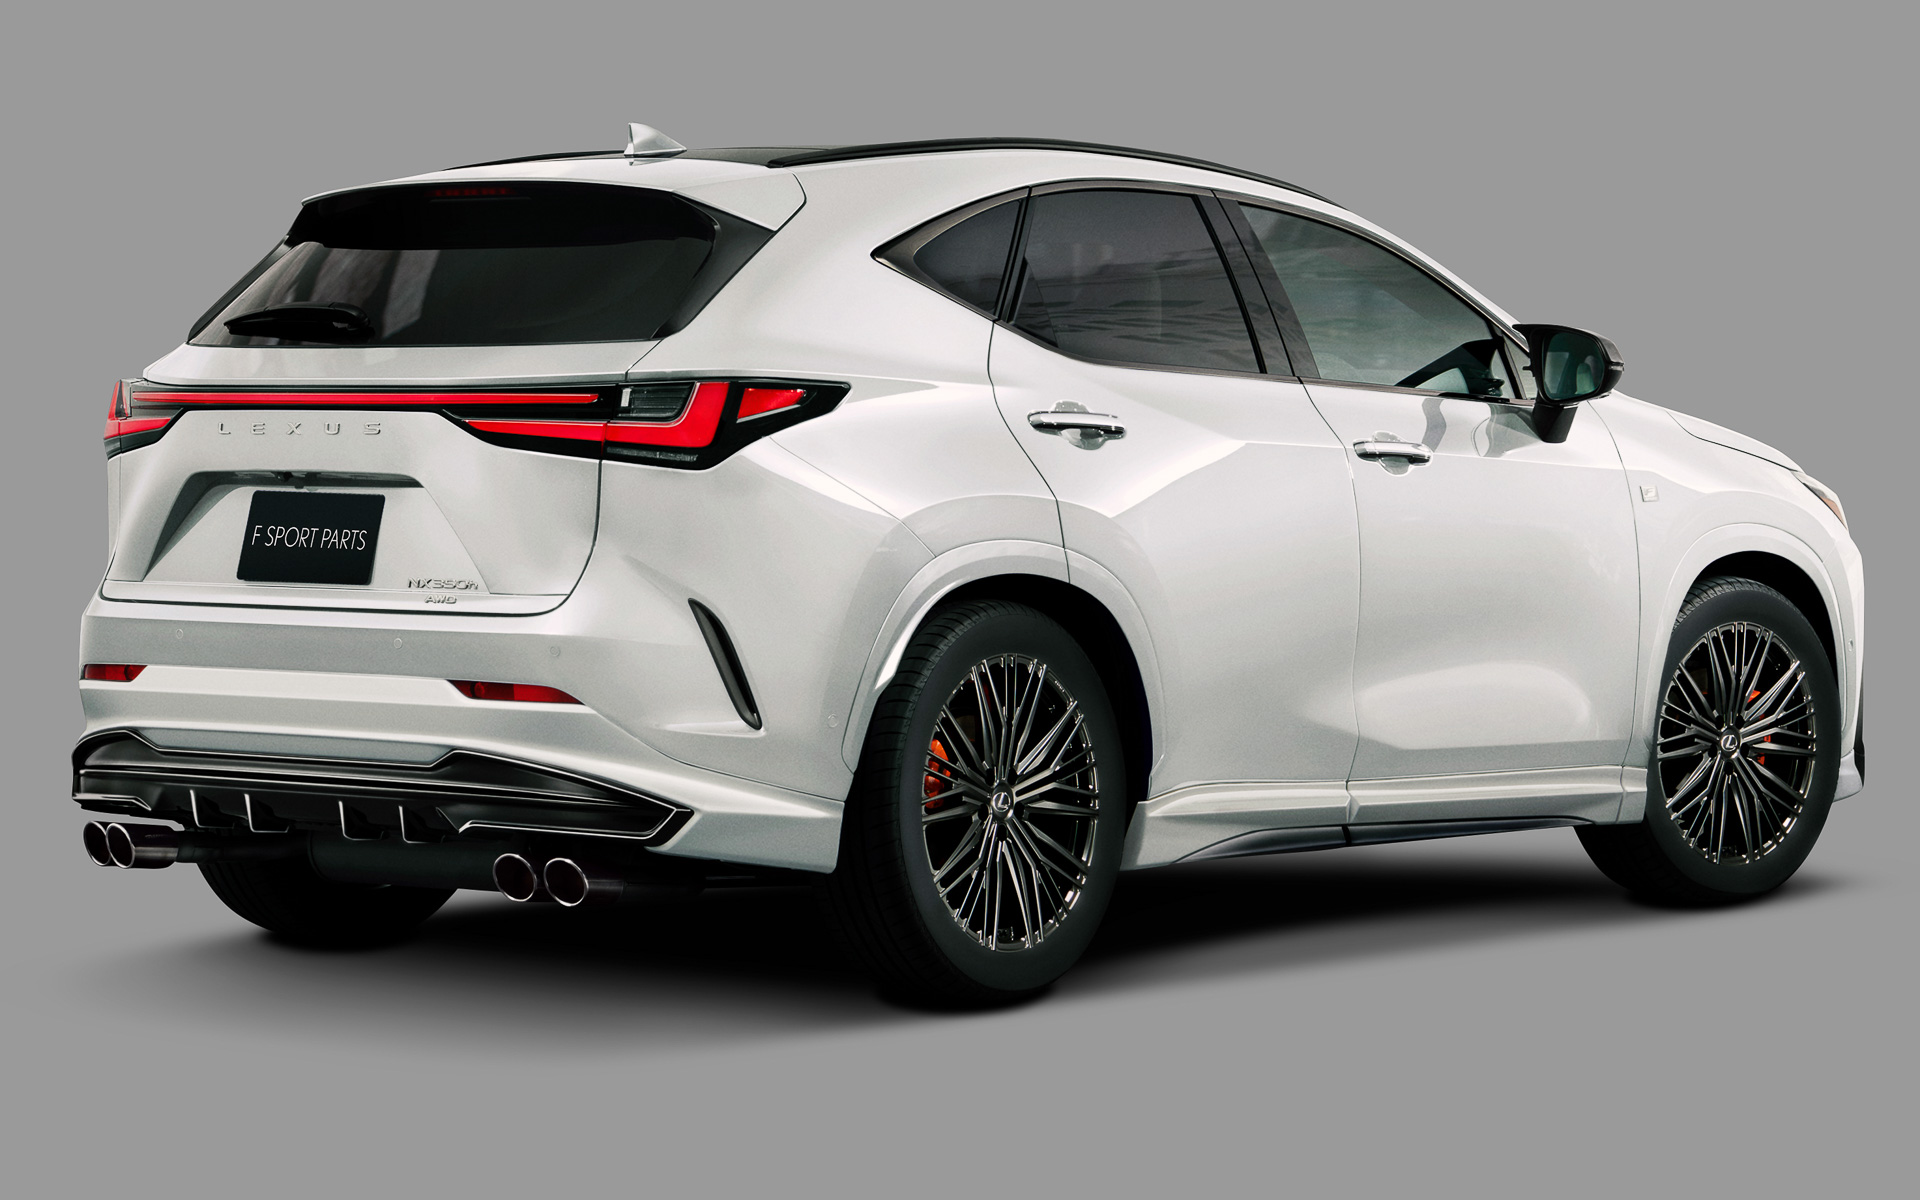 Lexus-NX-TRD-parts-2